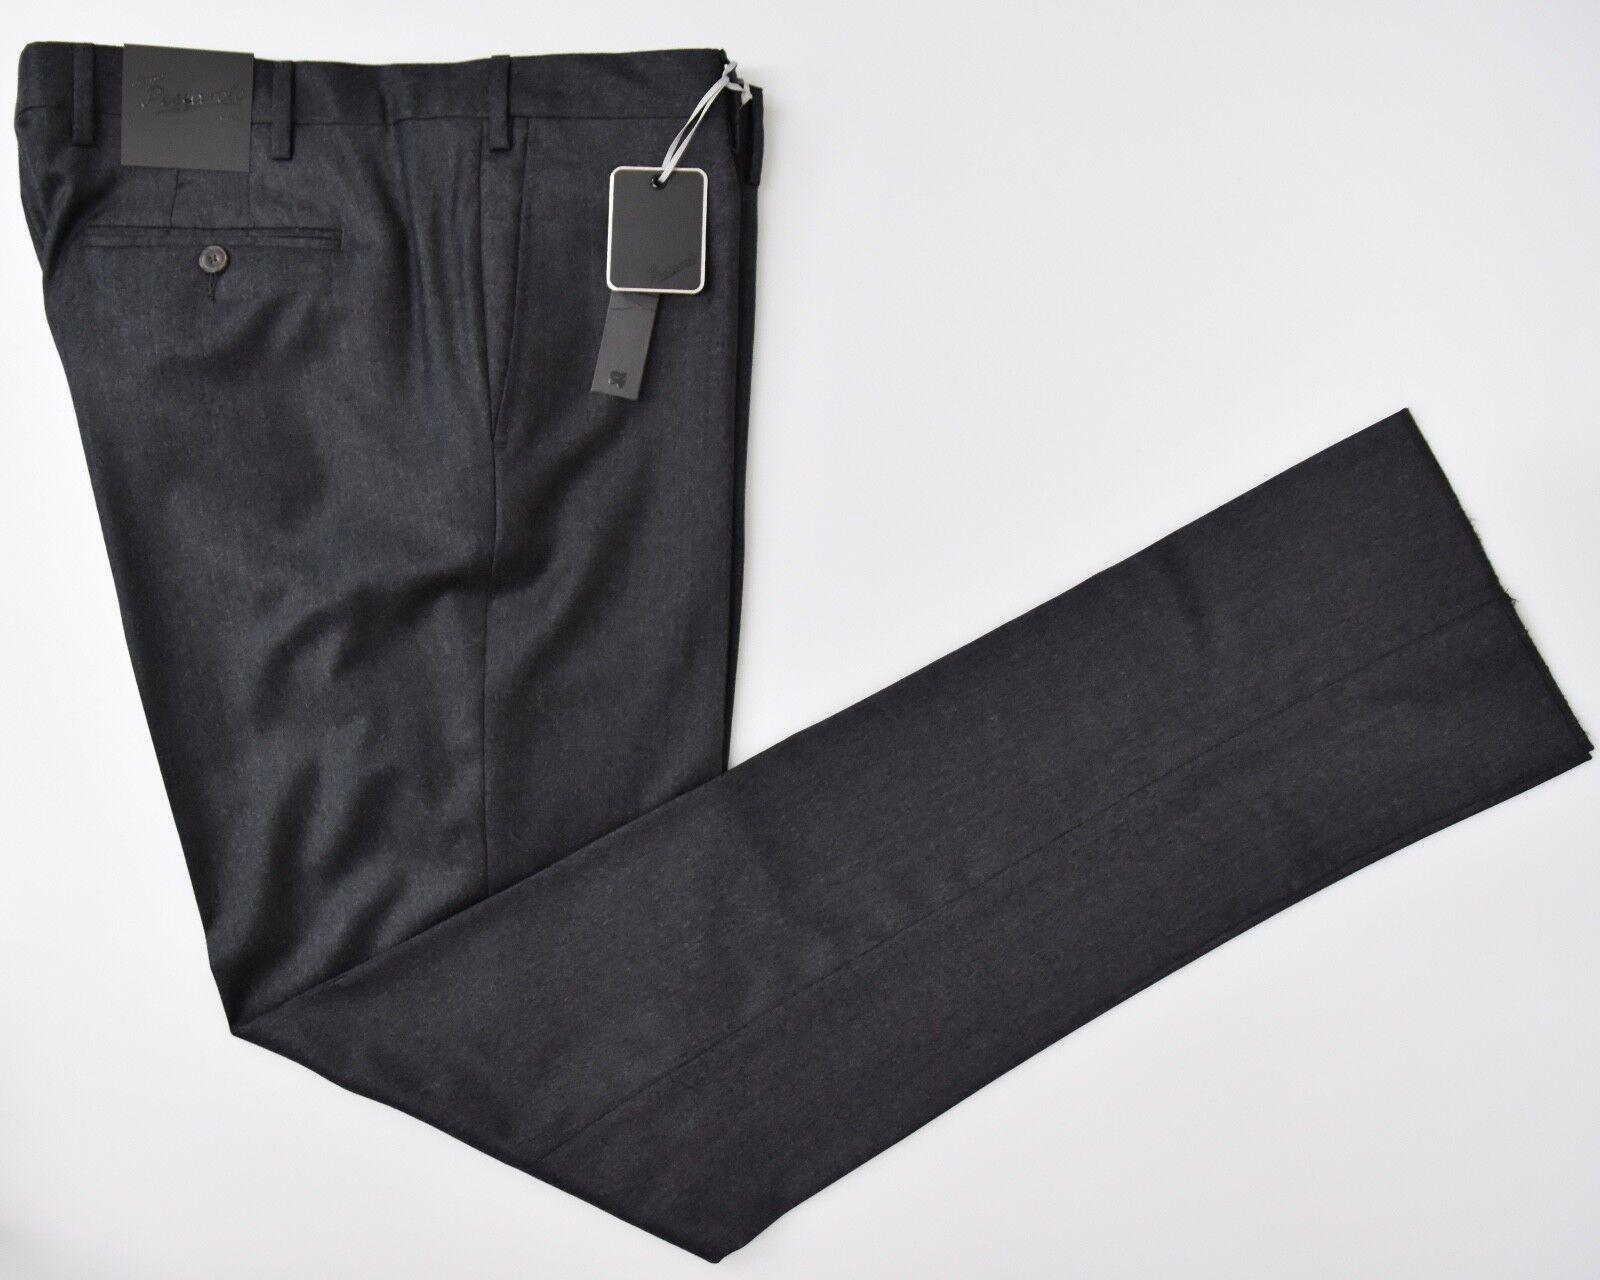 NEW MARCO PESCAROLO DRESS PANT WOOL CASHMERE SILK SIZE 40 US 56 EU PECA48